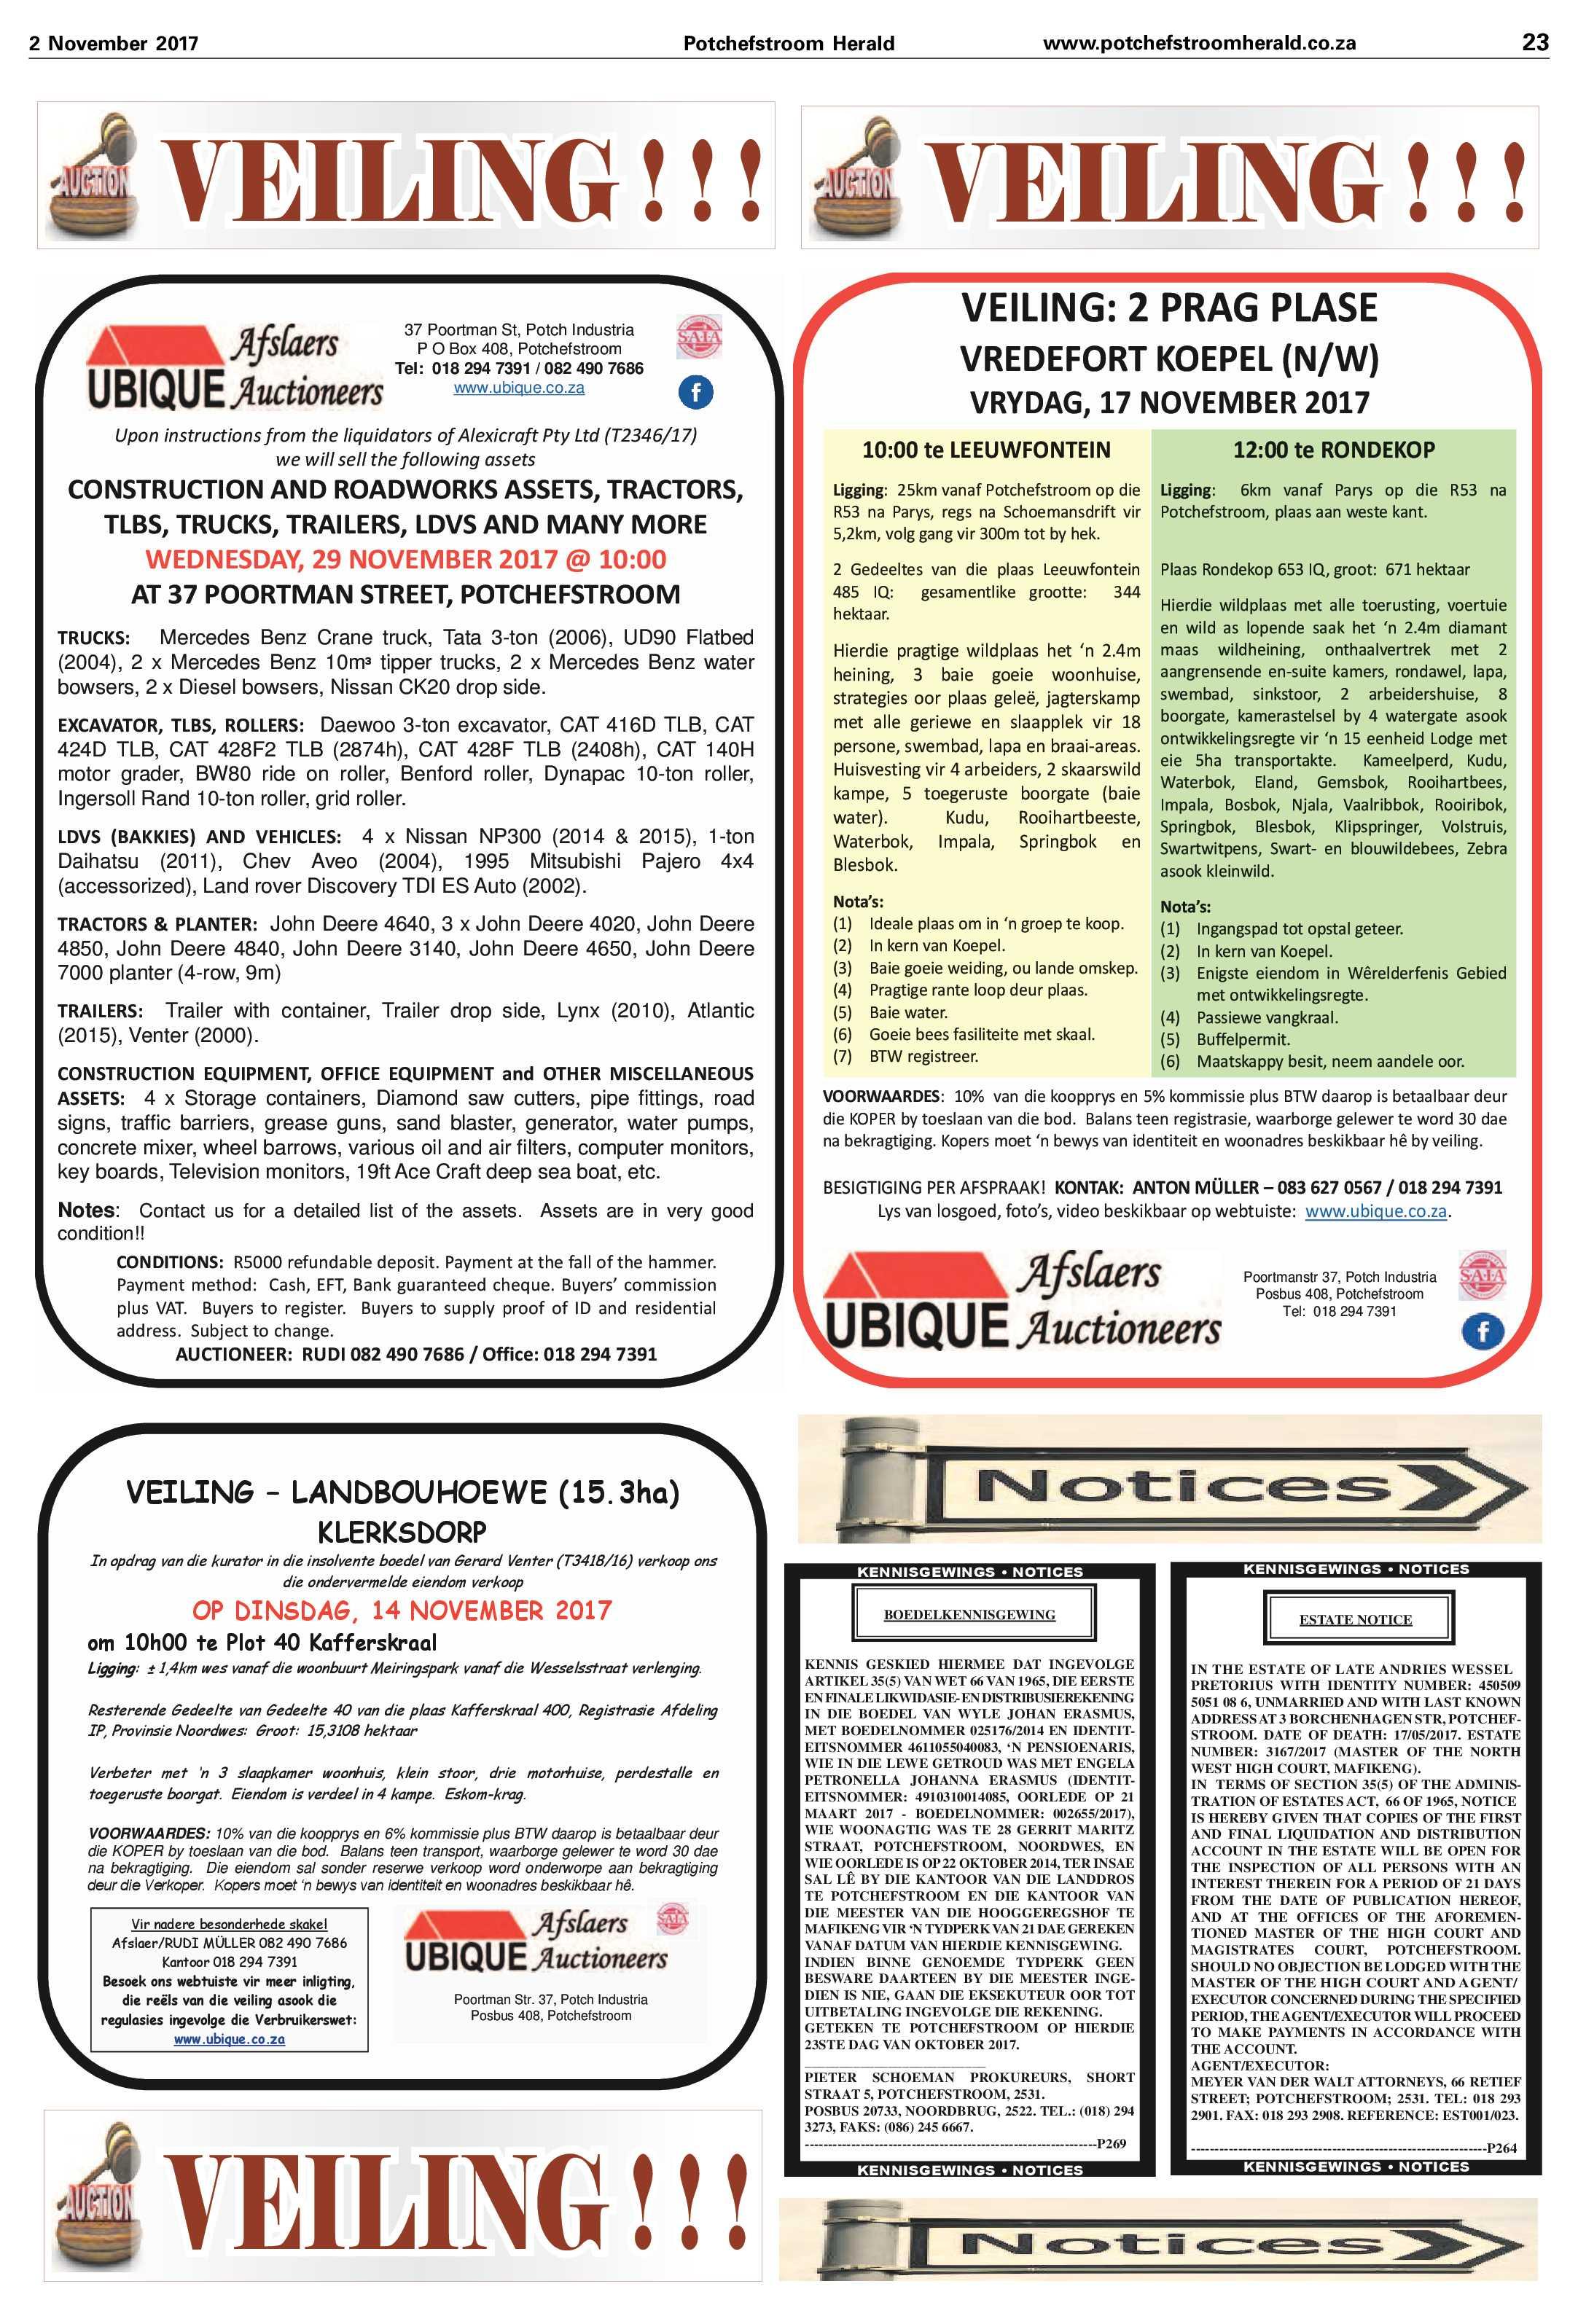 2-november-2017-epapers-page-24